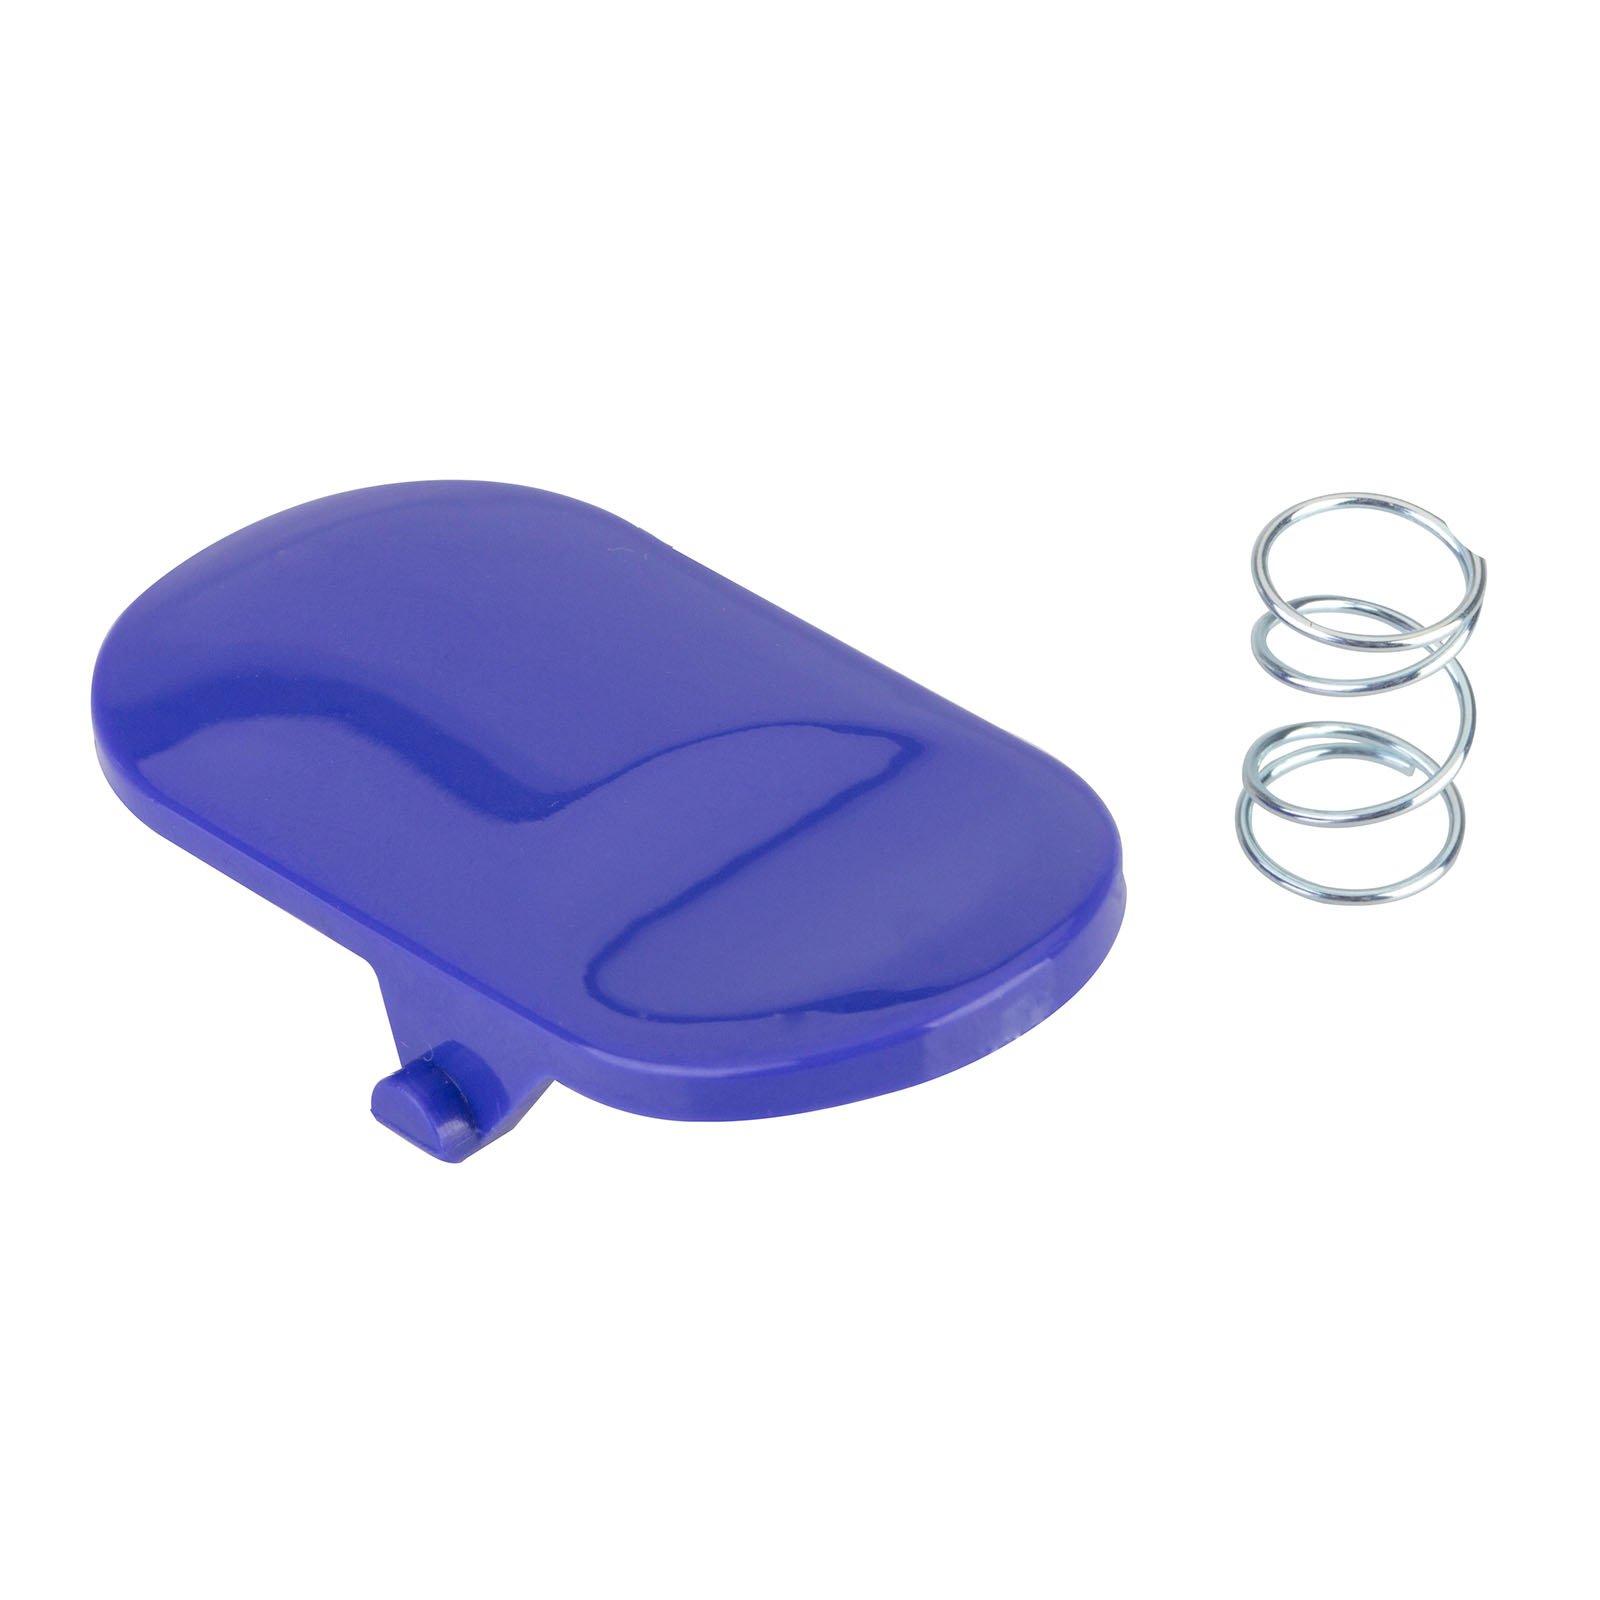 Кнопка для пылесоса dyson dyson dc25 animal filters